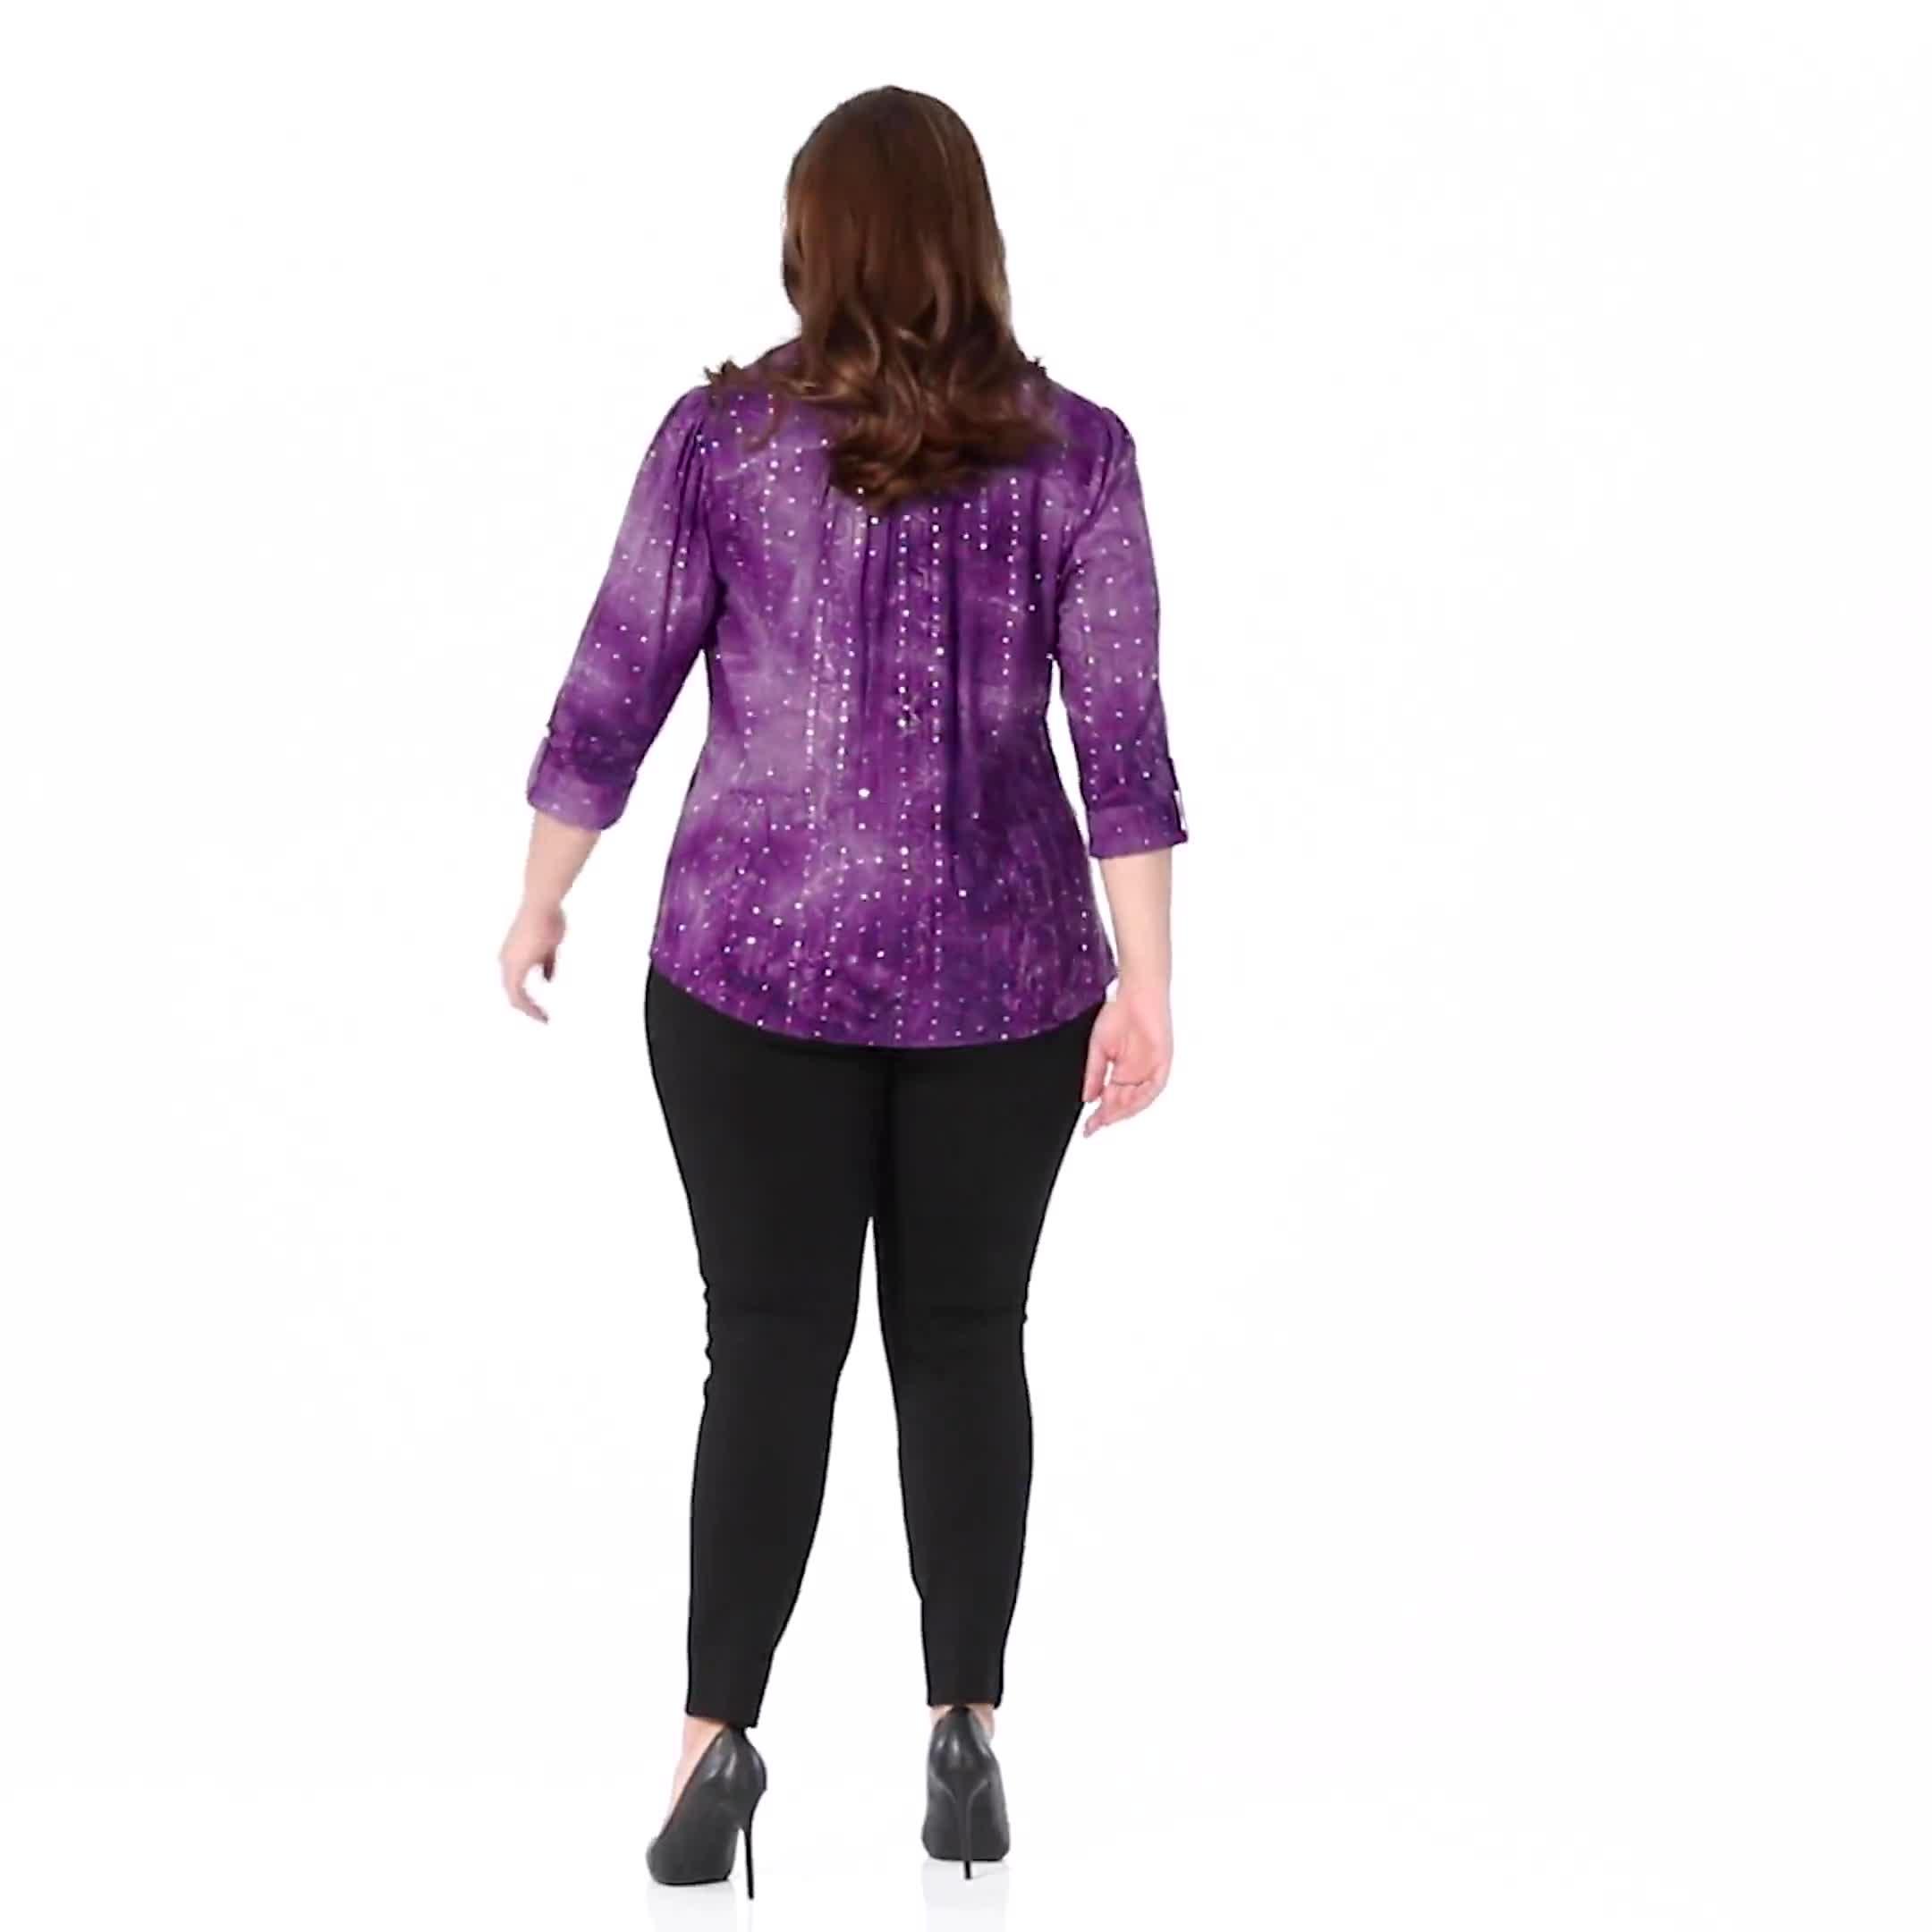 Roz & Ali Purple Sequin Tie Dye Pintuck Popover - Plus - Video